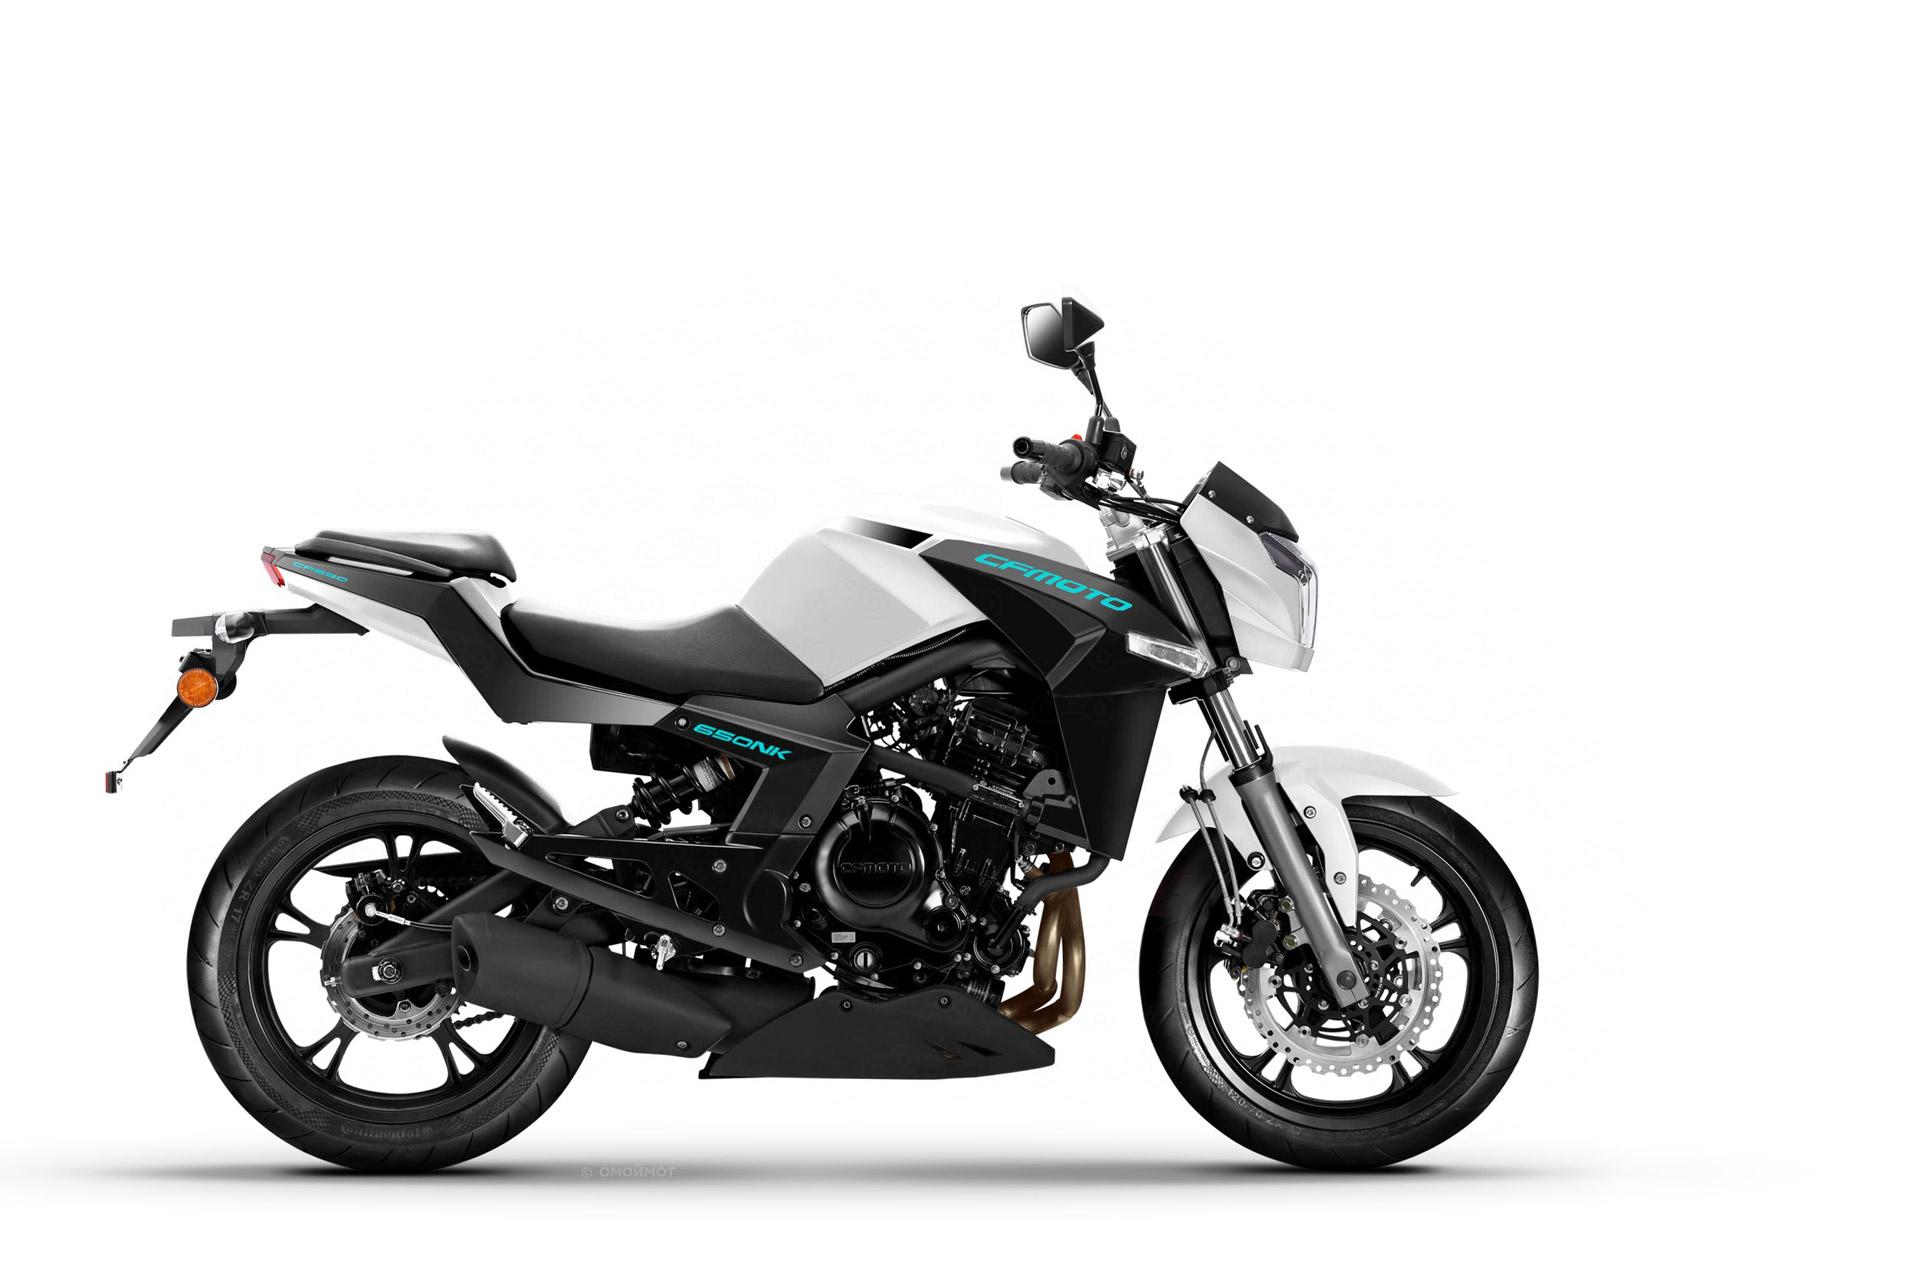 Мотоцикл CF-Moto 650NK – нейкед на базе Kawasaki Er-6n.